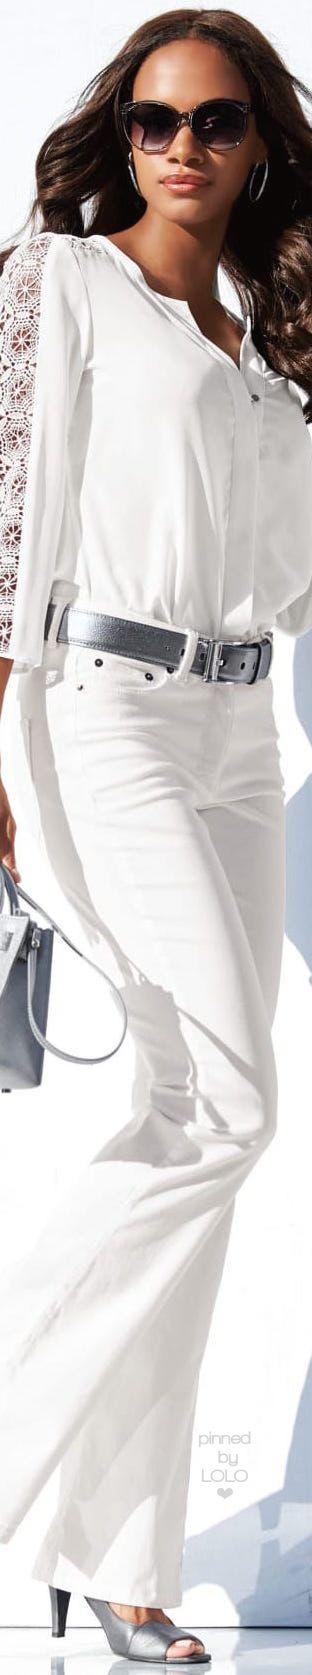 Madeleine   white women fashion outfit clothing style apparel @roressclothes closet ideas